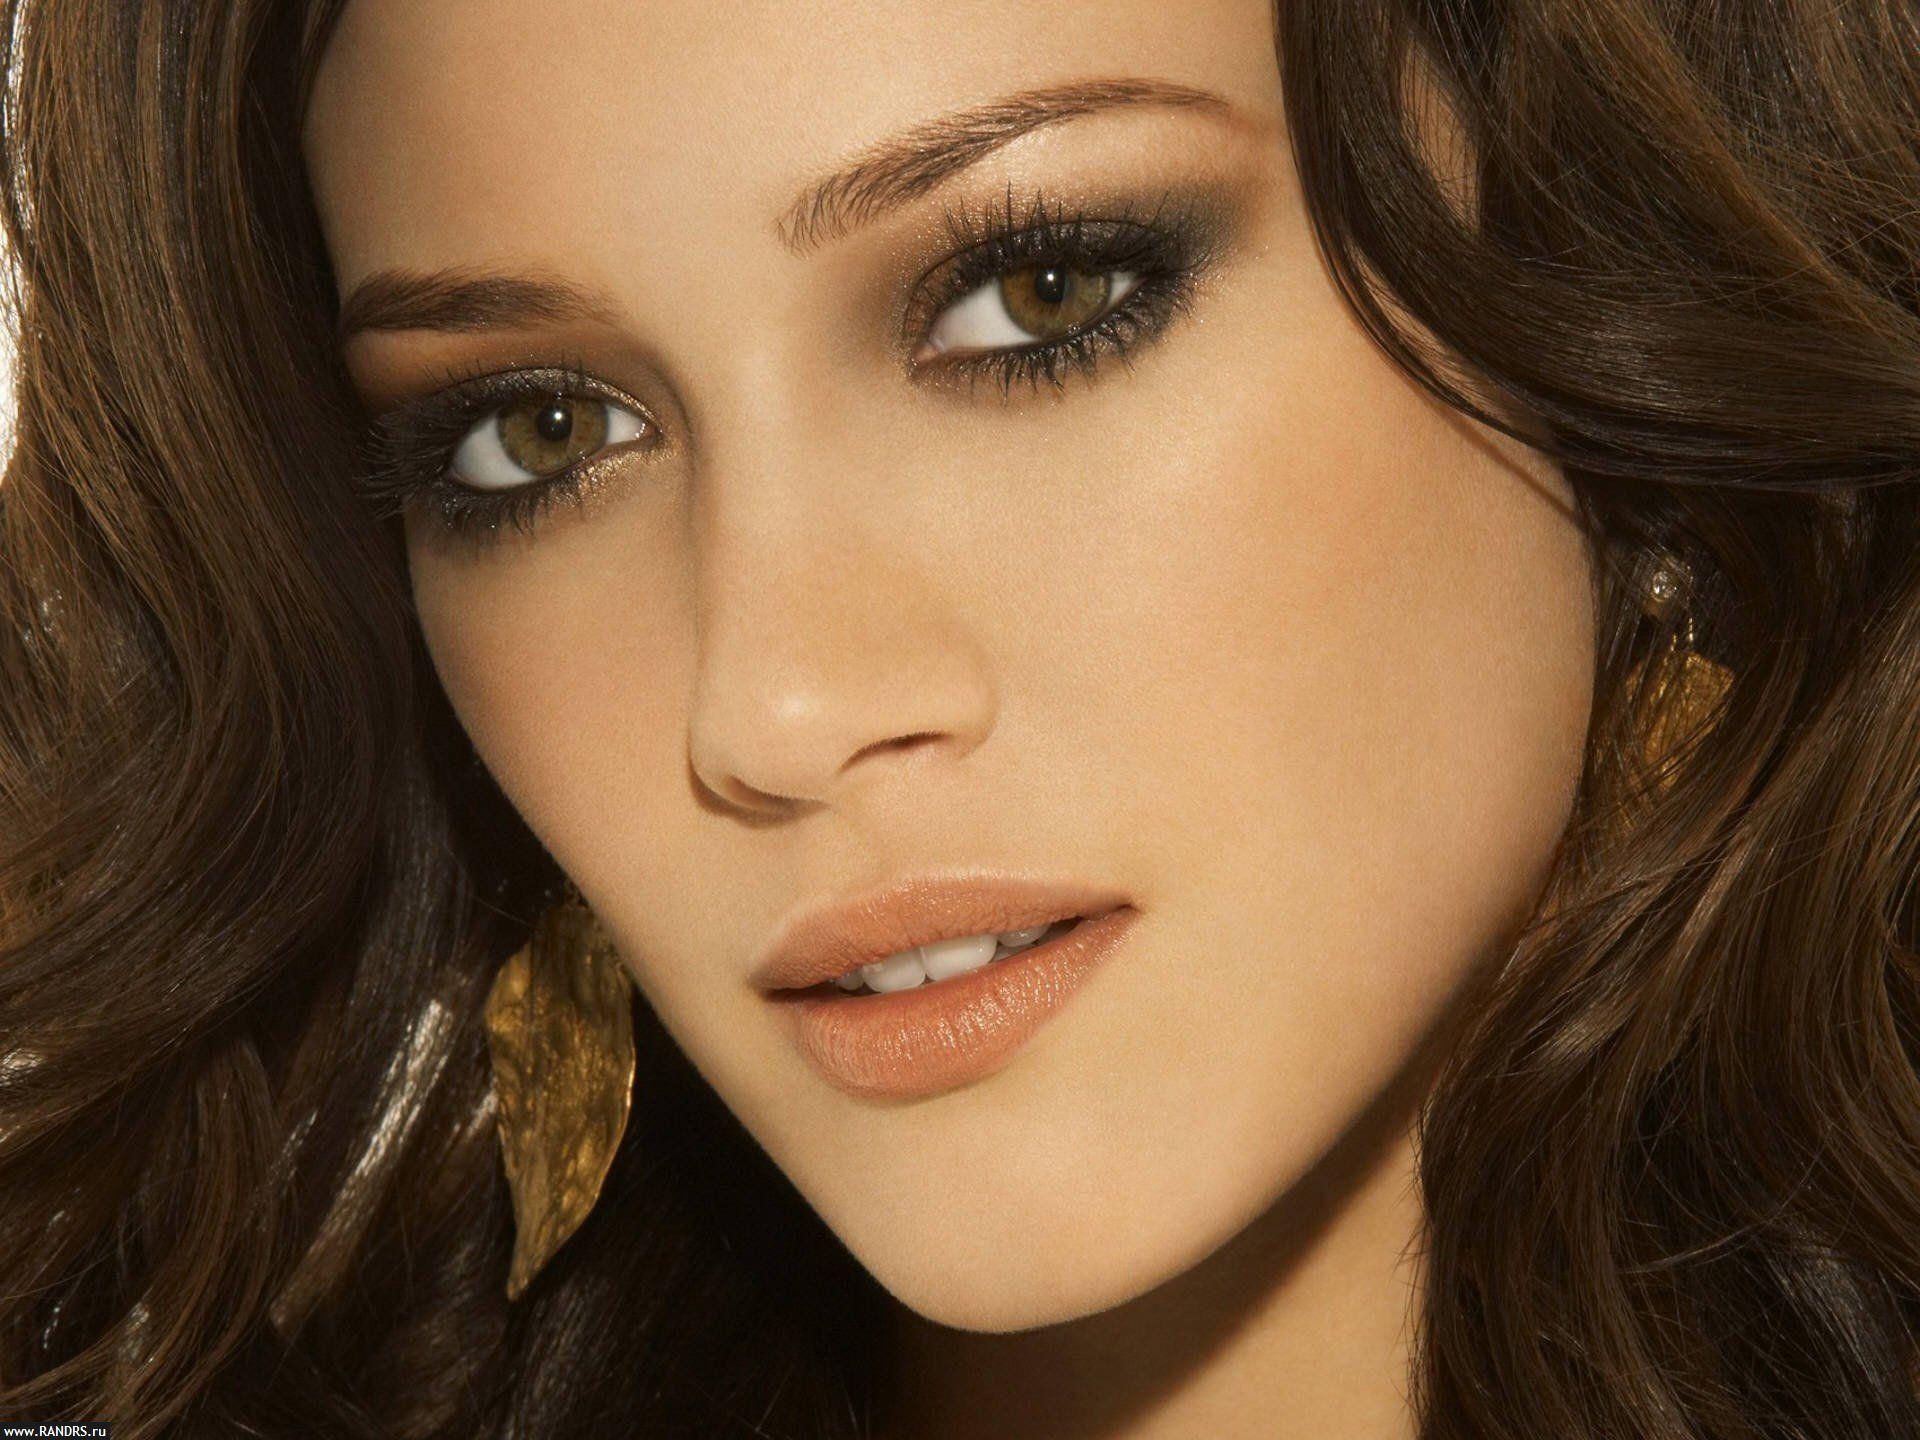 Amazing Set Of Beautiful Women Faces Hd Wallpapers - Beautiful Girls Faces , HD Wallpaper & Backgrounds